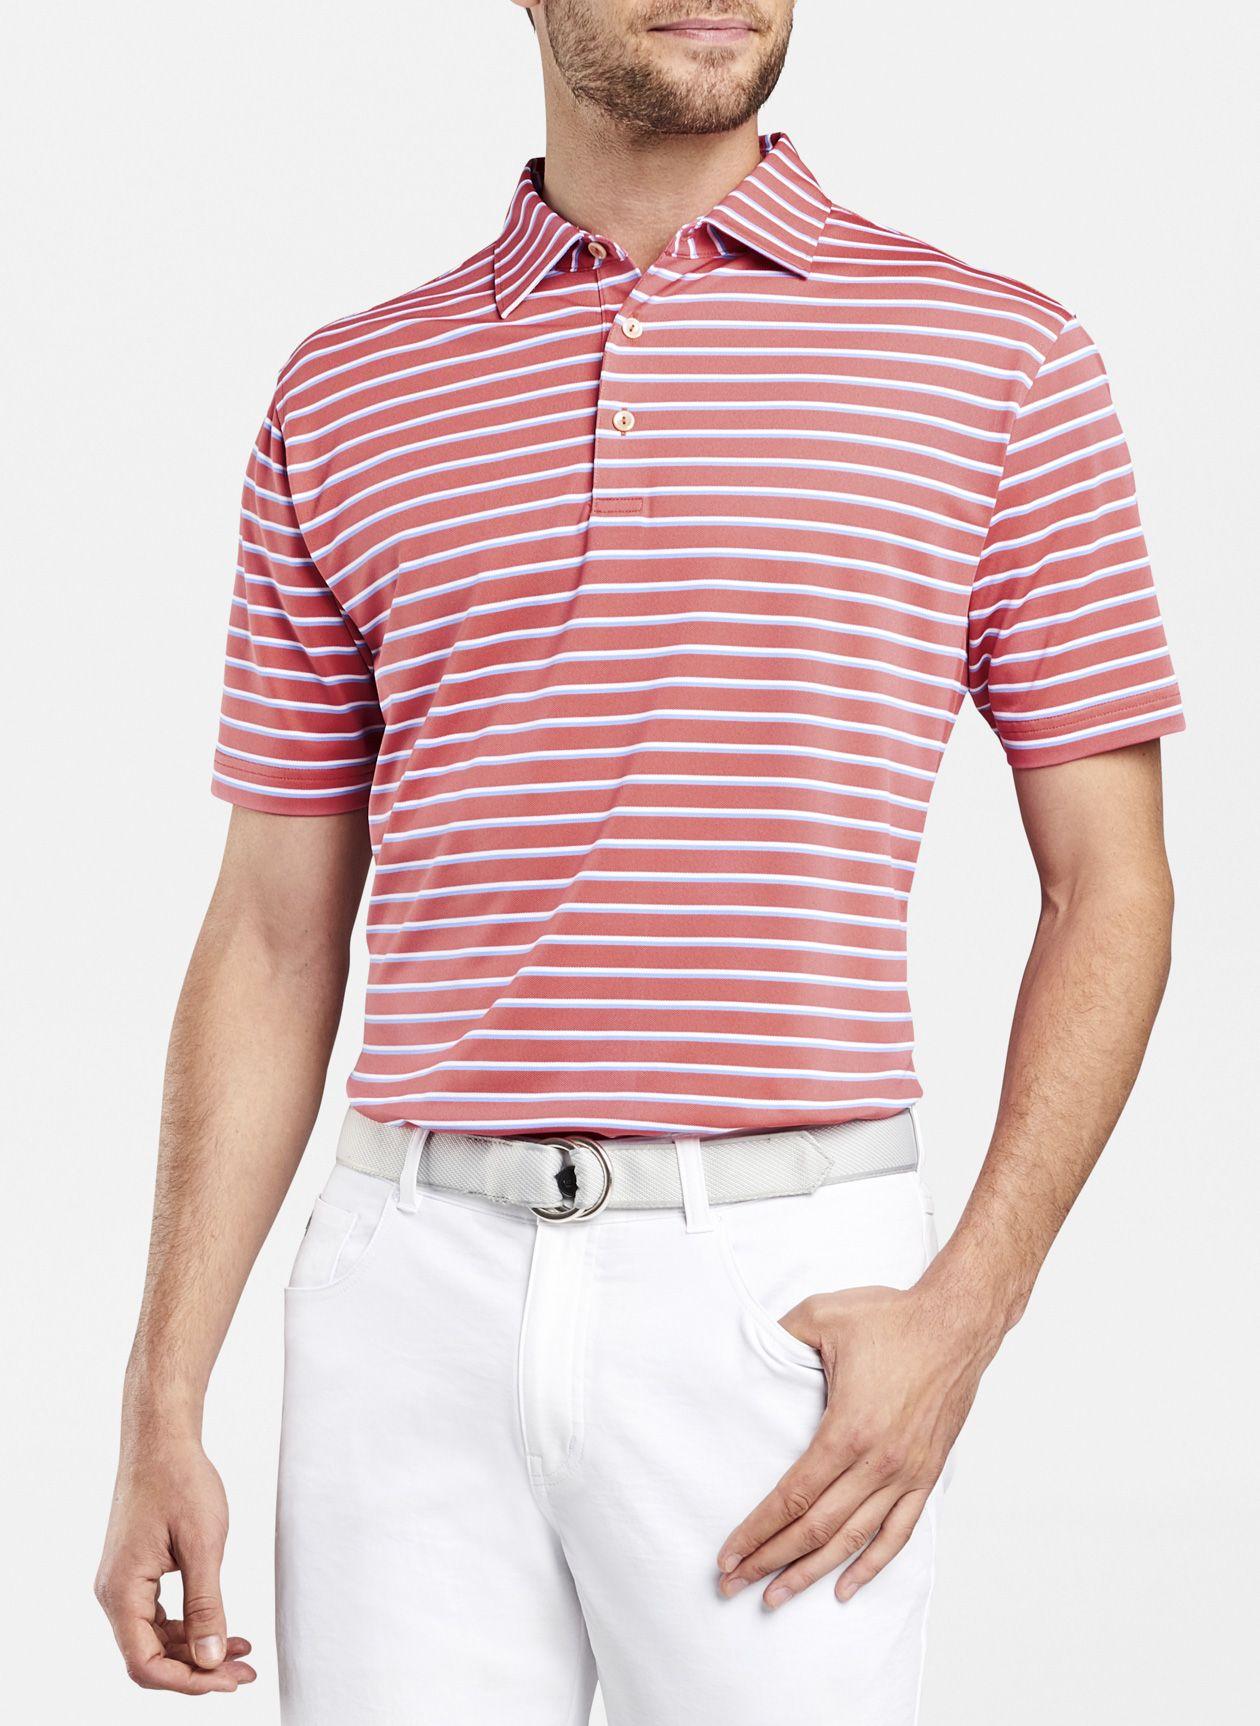 495aab2c Coley Stripe Stretch Mesh Polo | Peter Millar | Golfing in 2019 ...